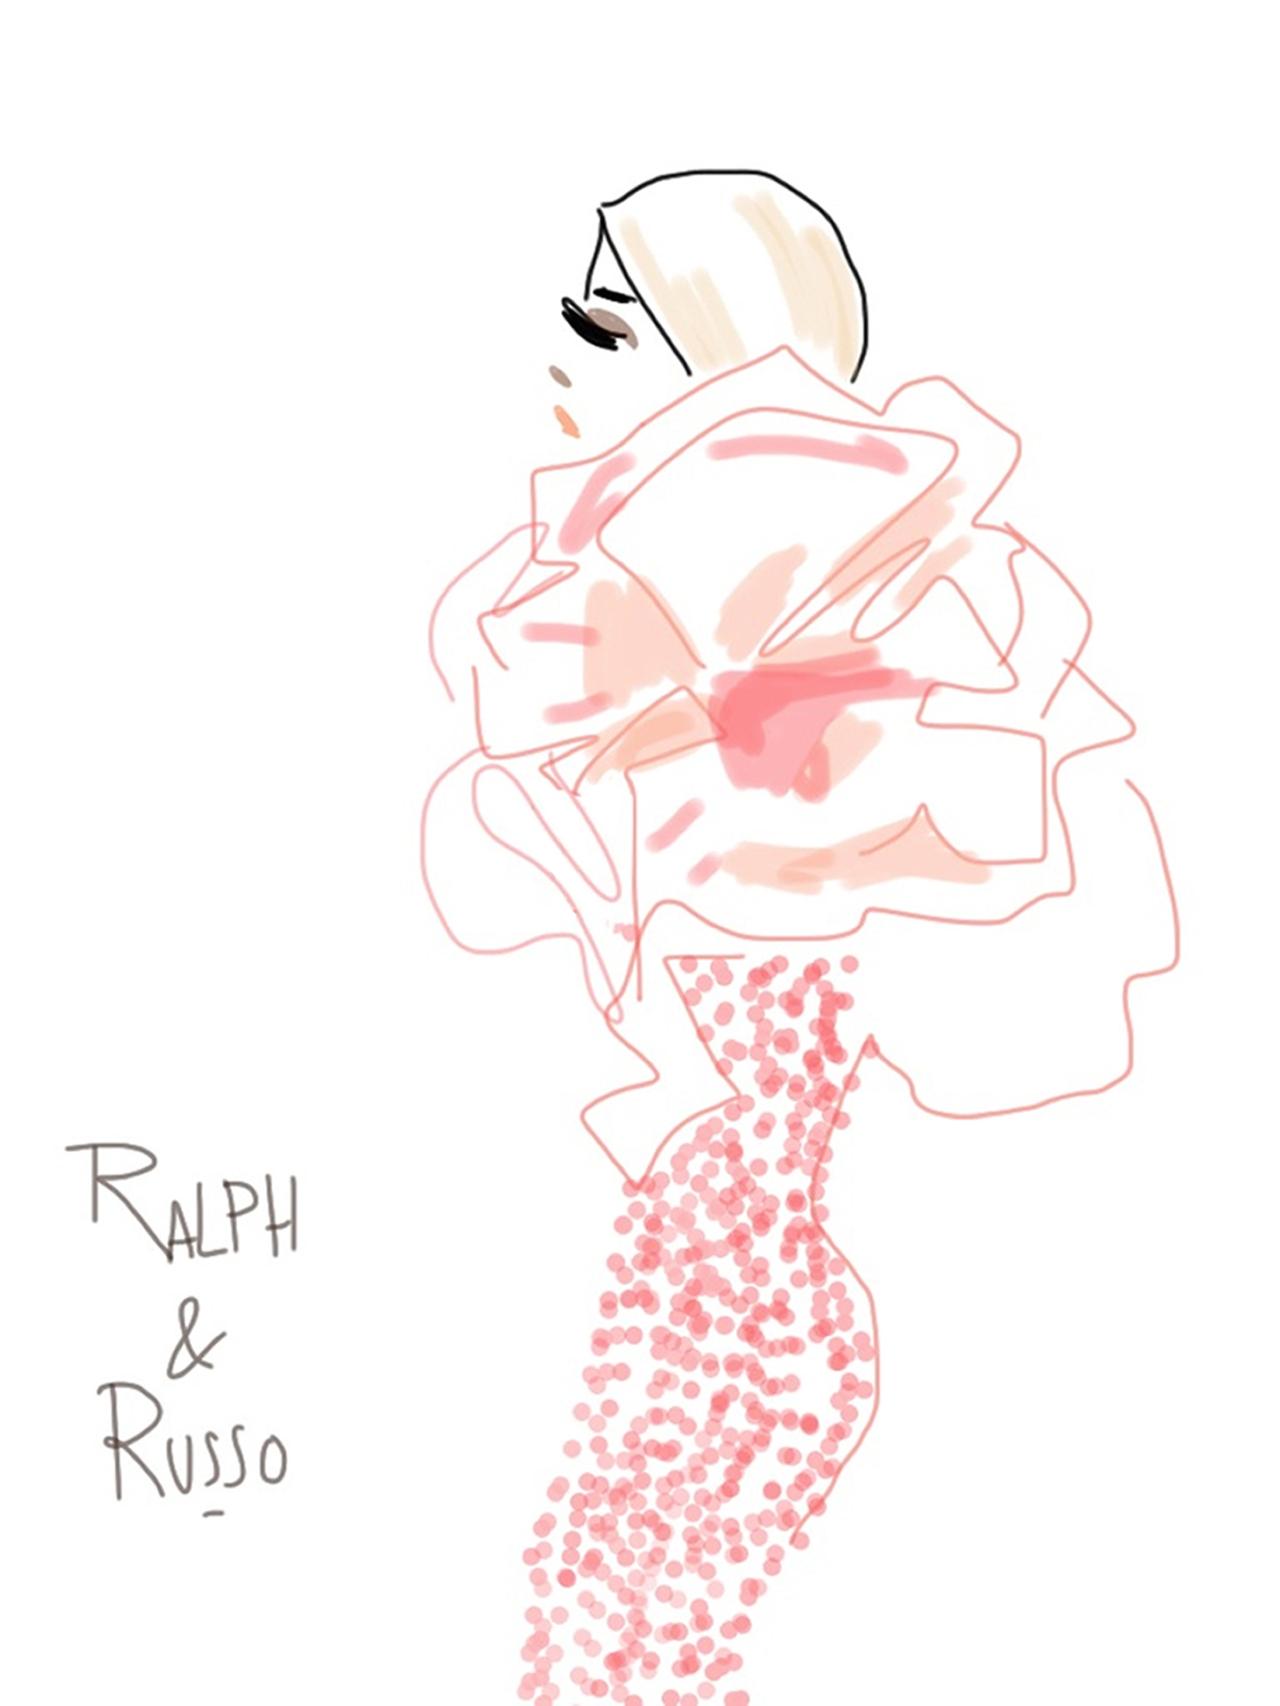 Ralph&Russo-Show sketch 6